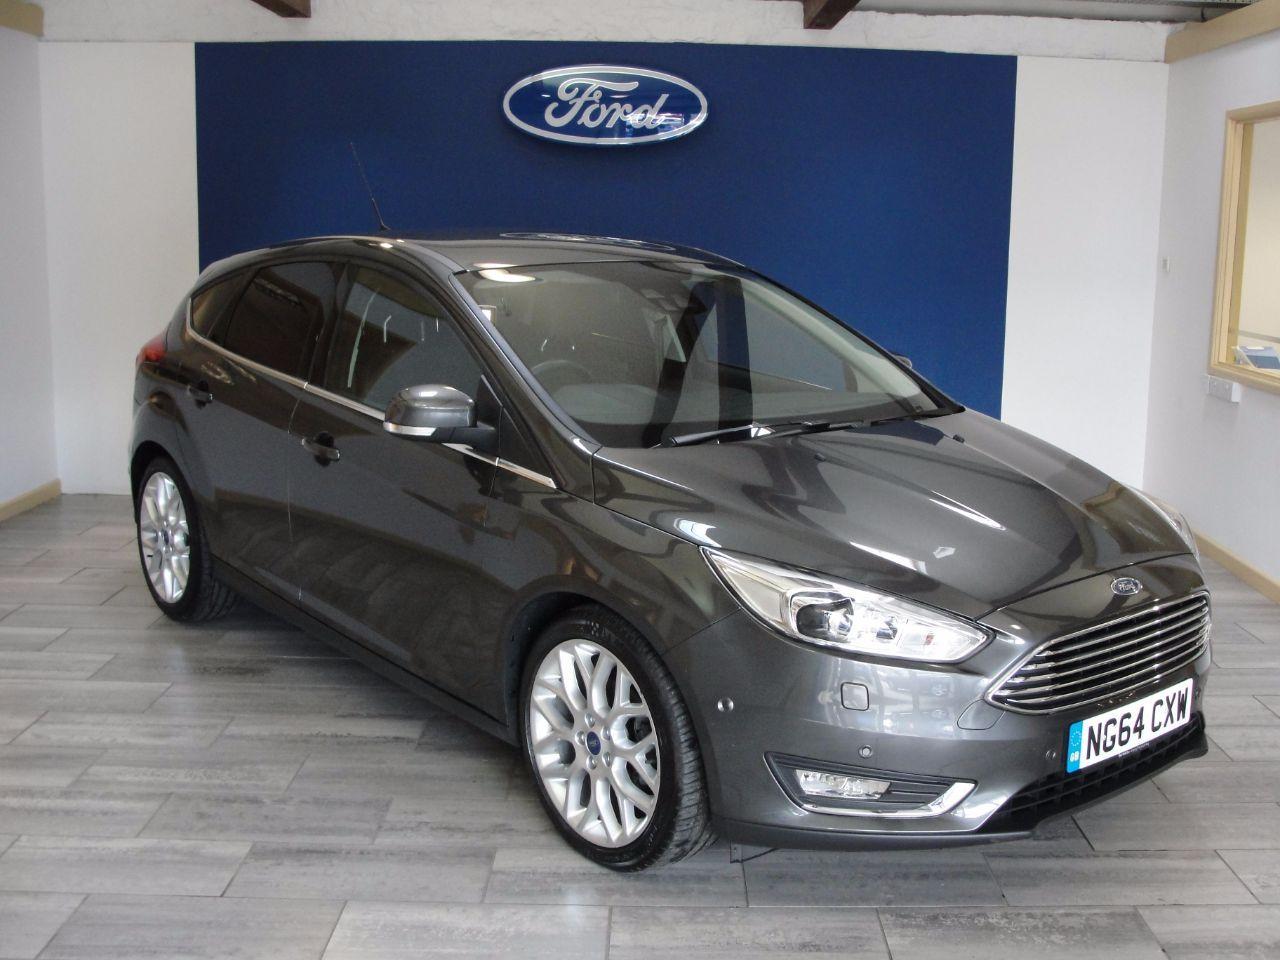 Ford Focus 1 0 Ecoboost 125 Titanium X 5dr Hatchback Petrol Grey